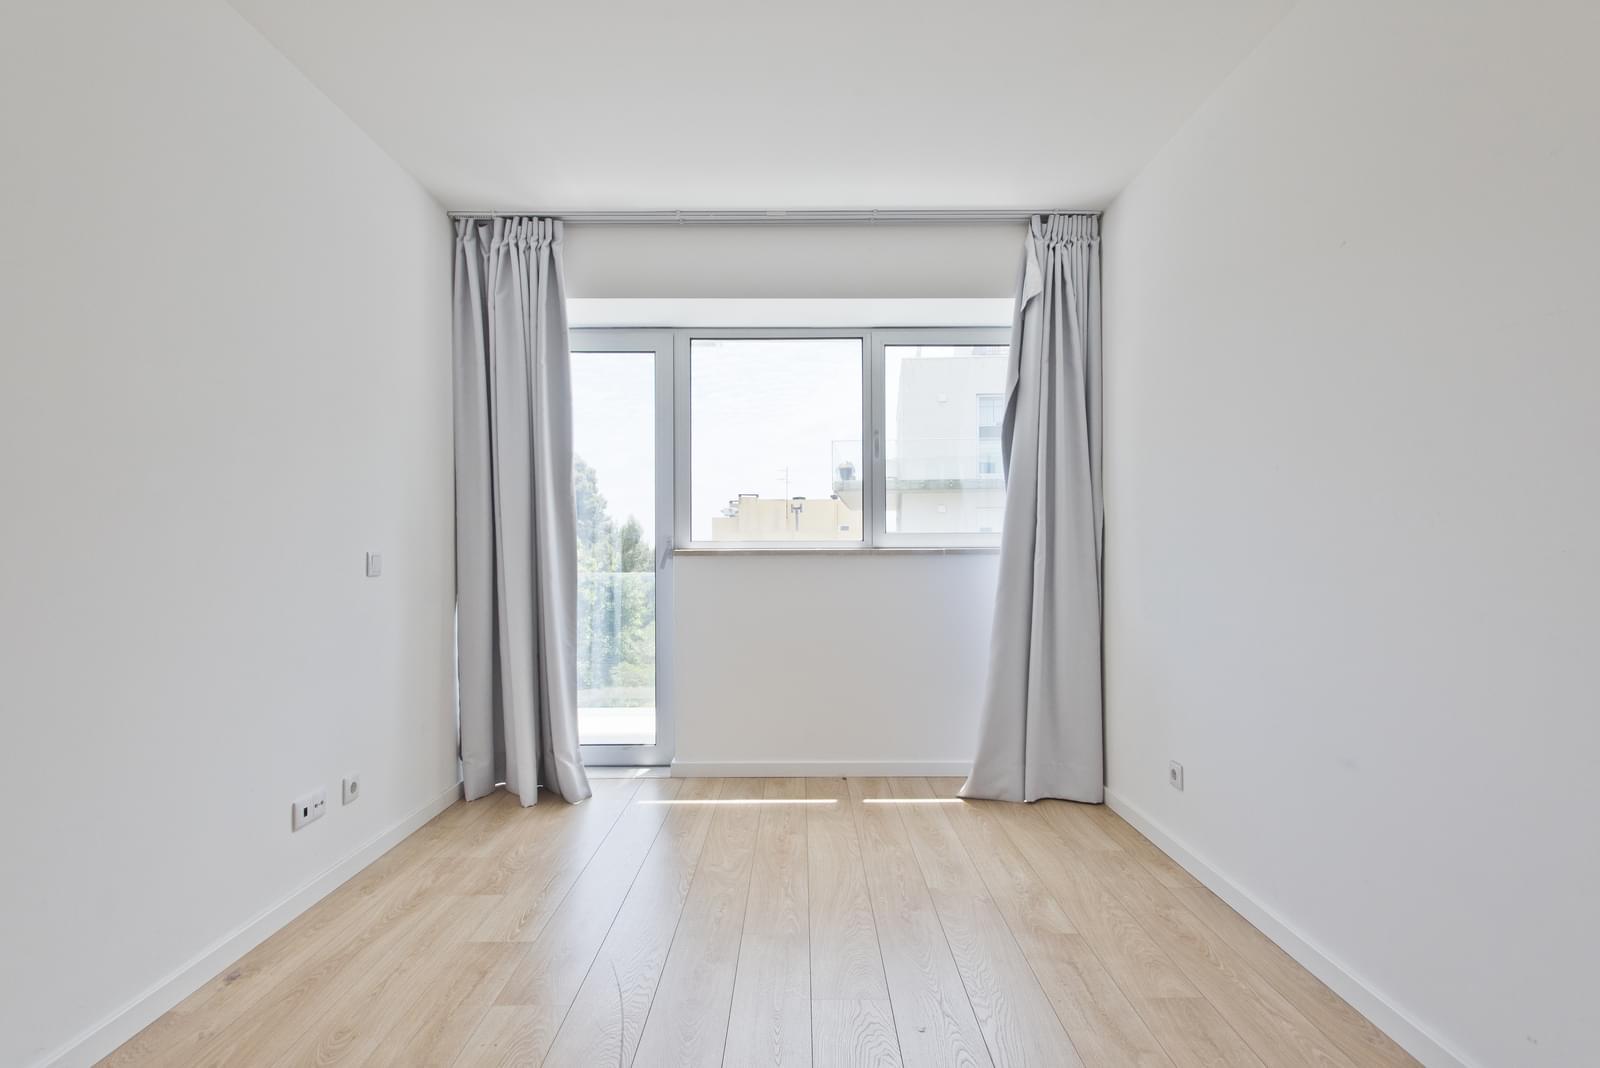 pf13975-apartamento-t4-oeiras-5d71b74a-6291-45ab-8175-416e08212f12